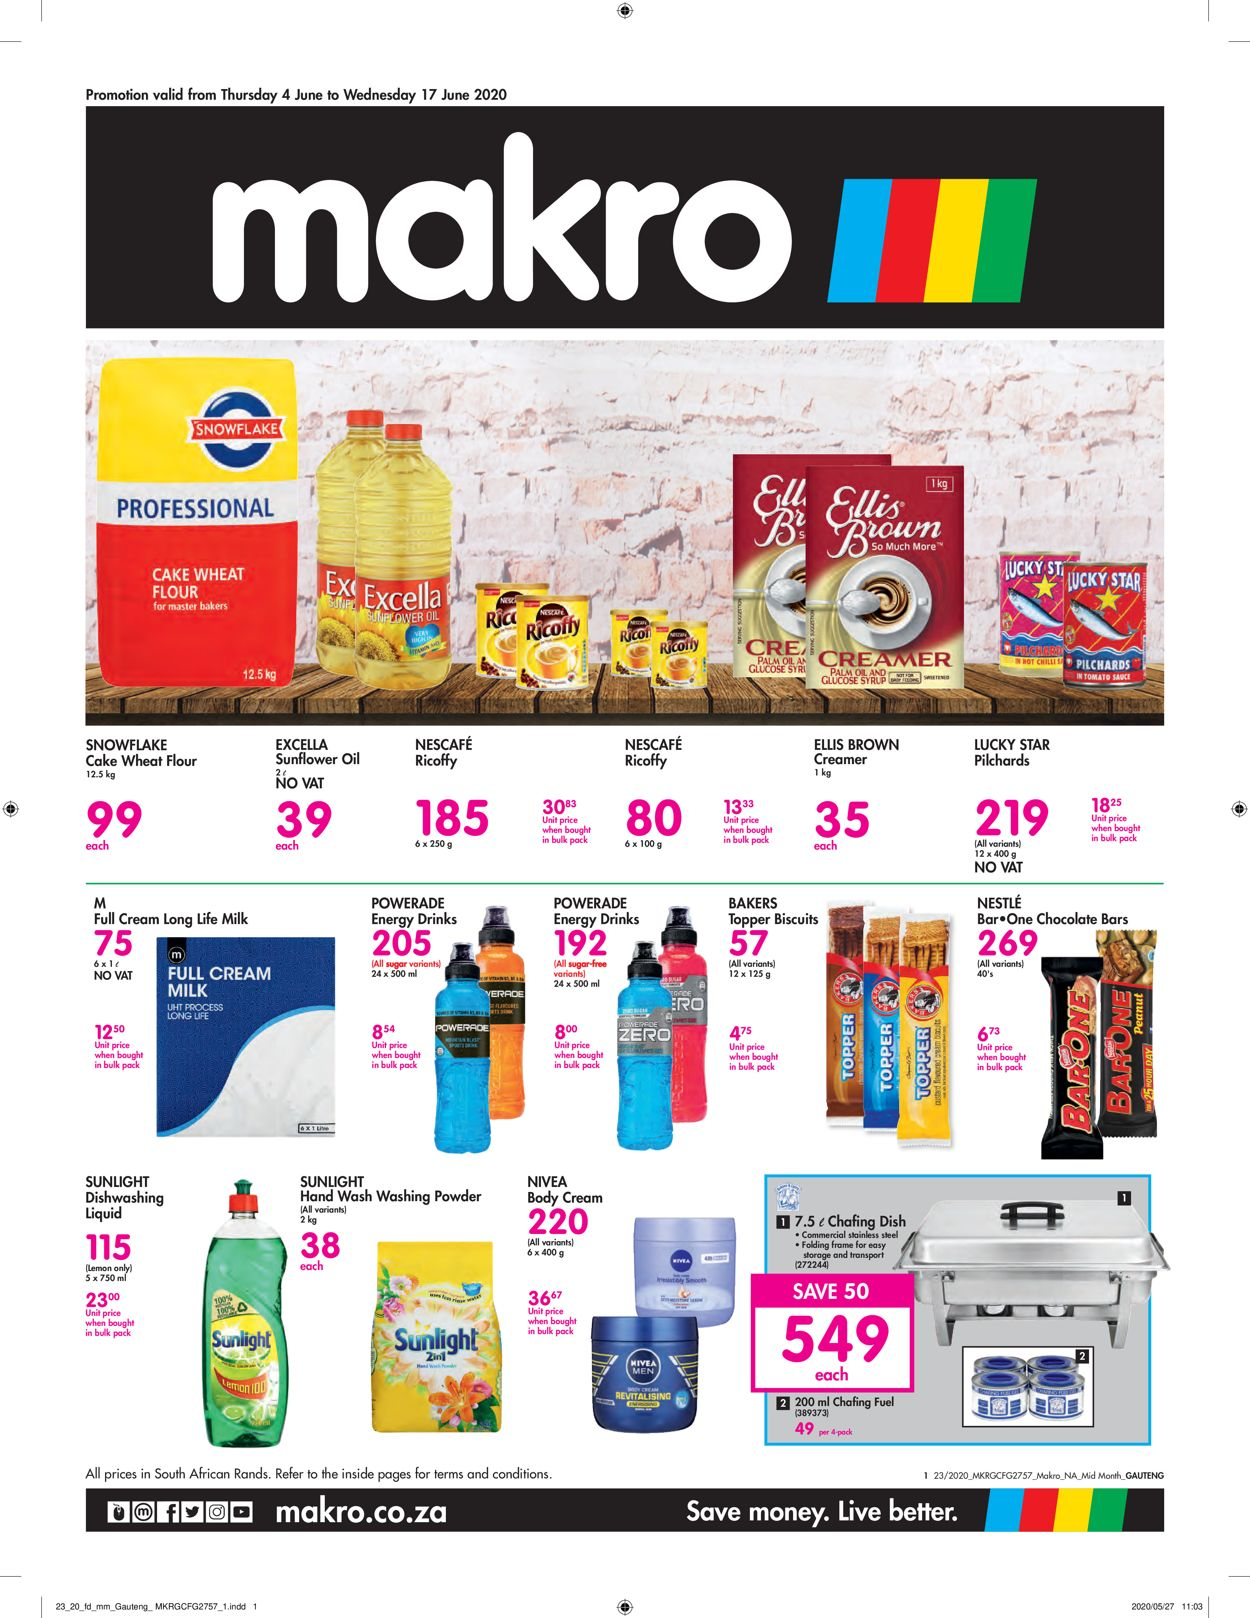 Makro Catalogue - 2020/06/04-2020/06/17